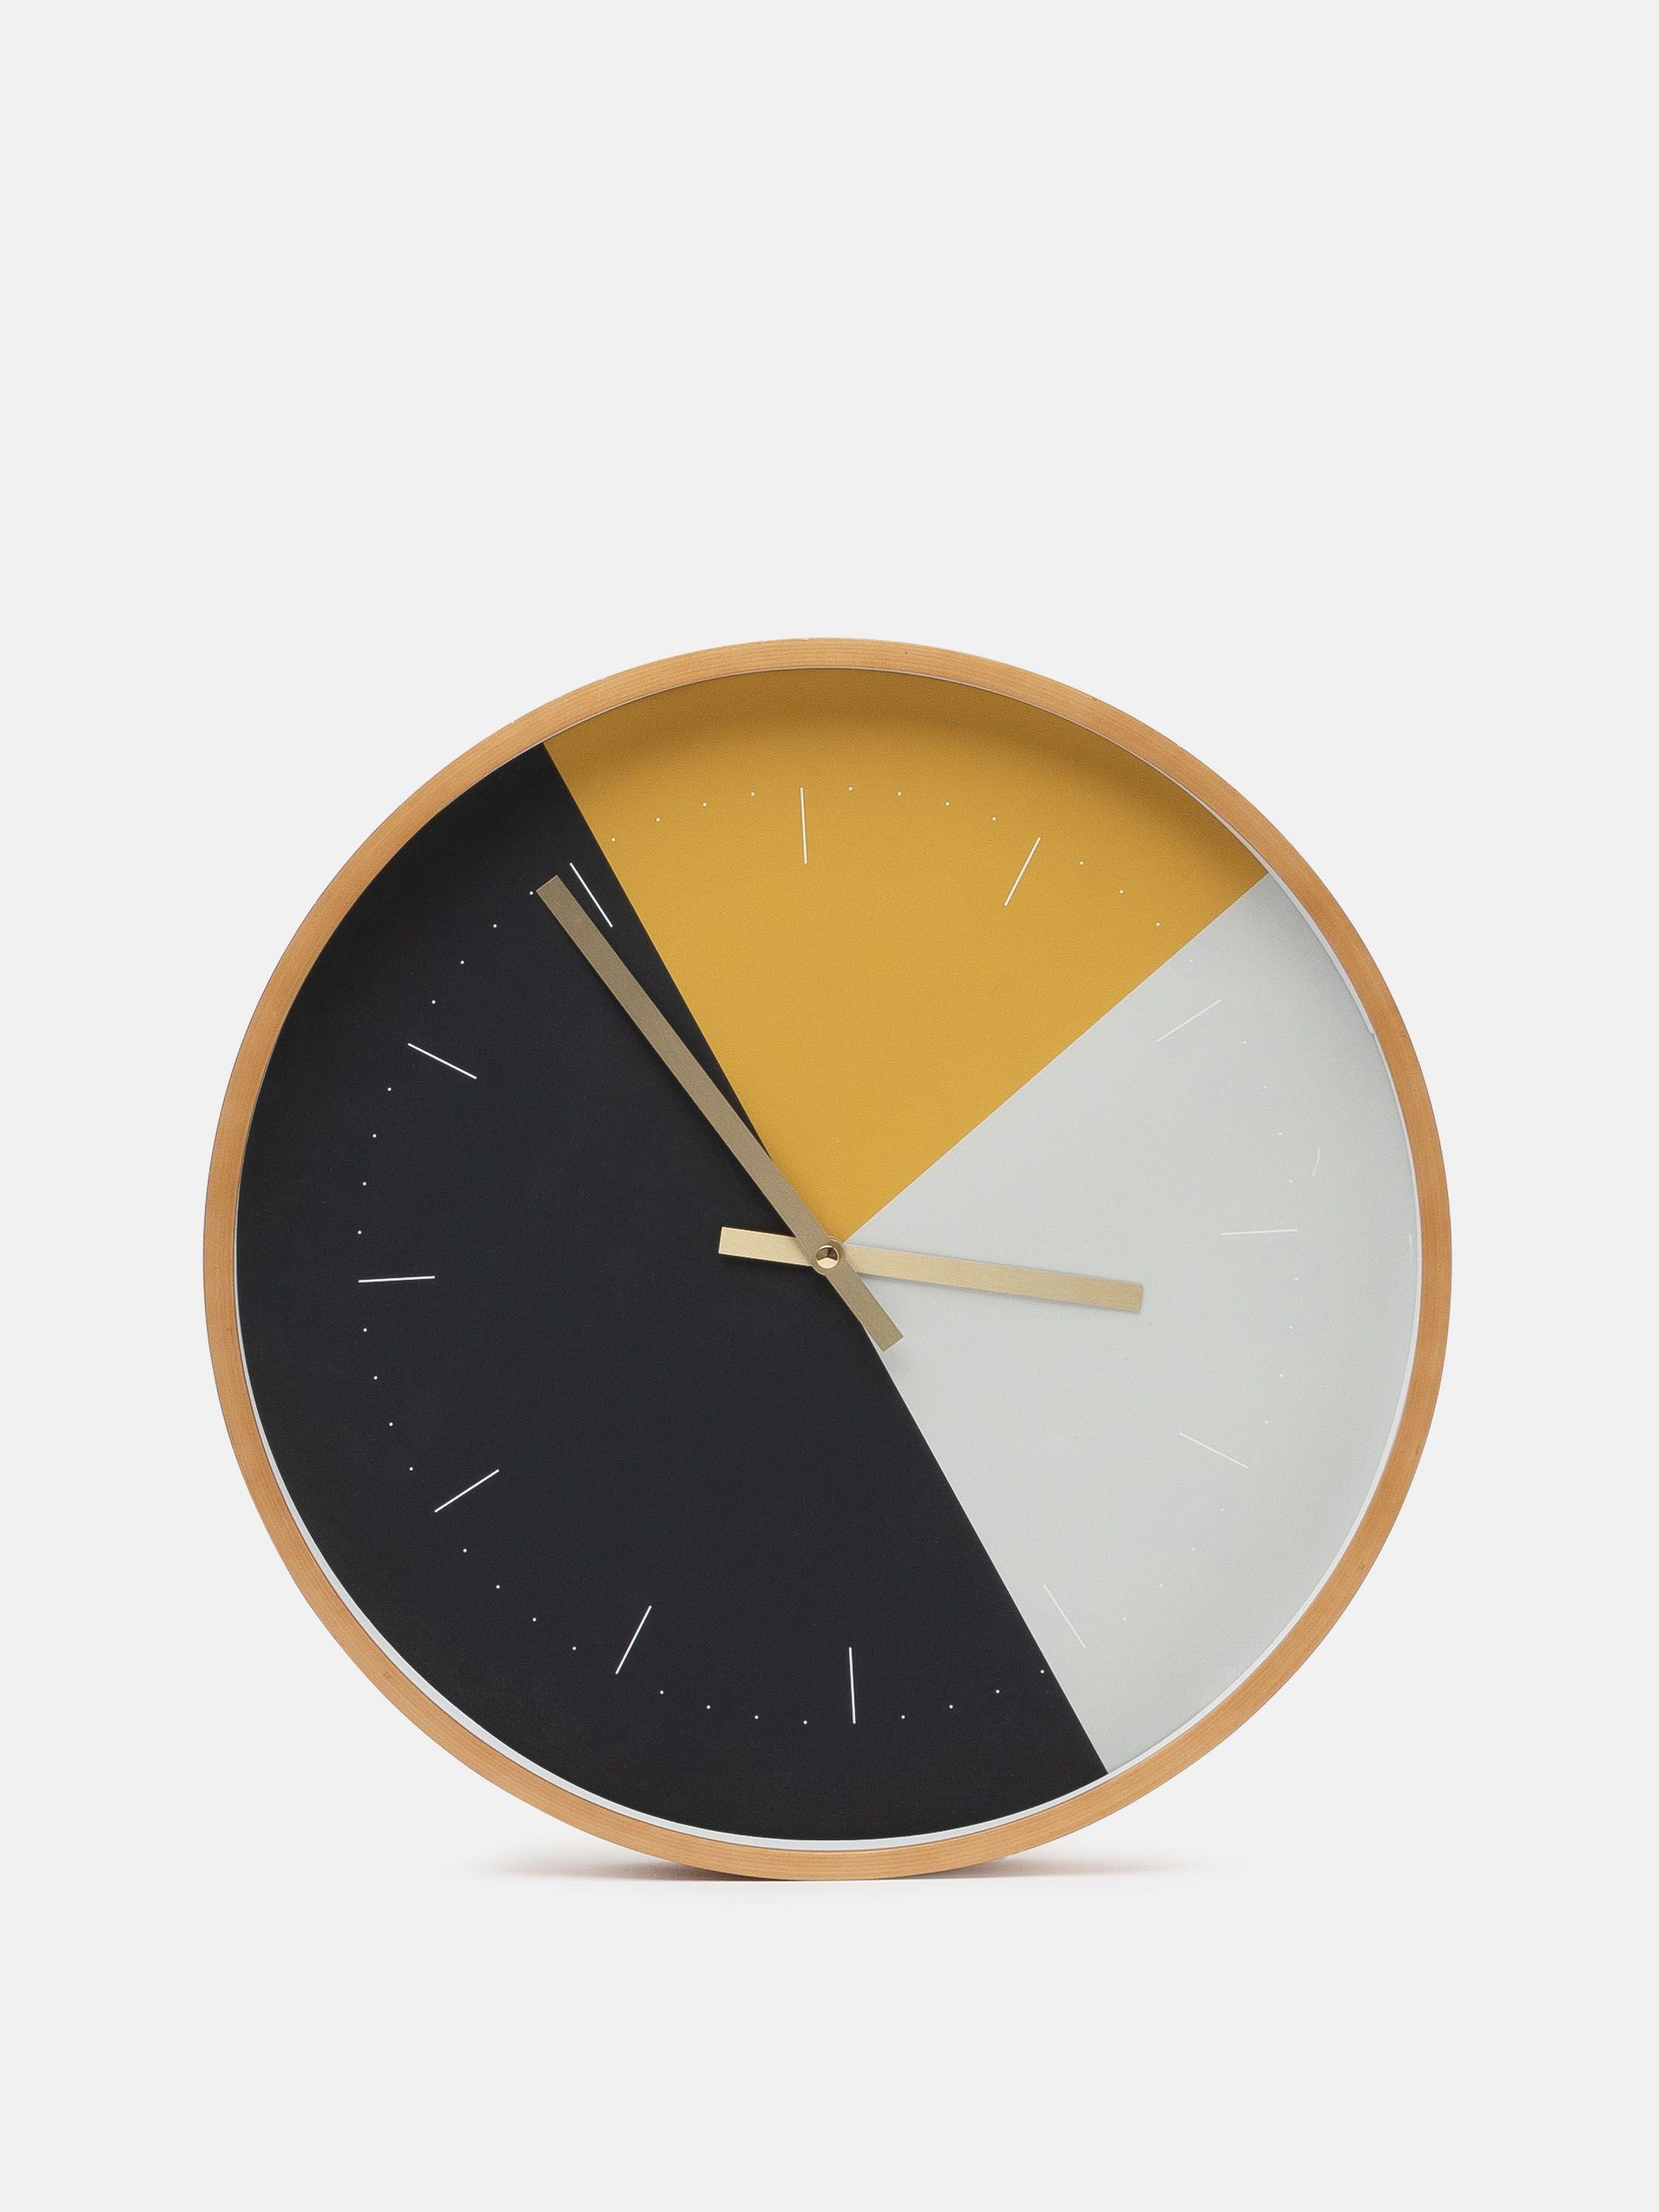 custom made wall clocks